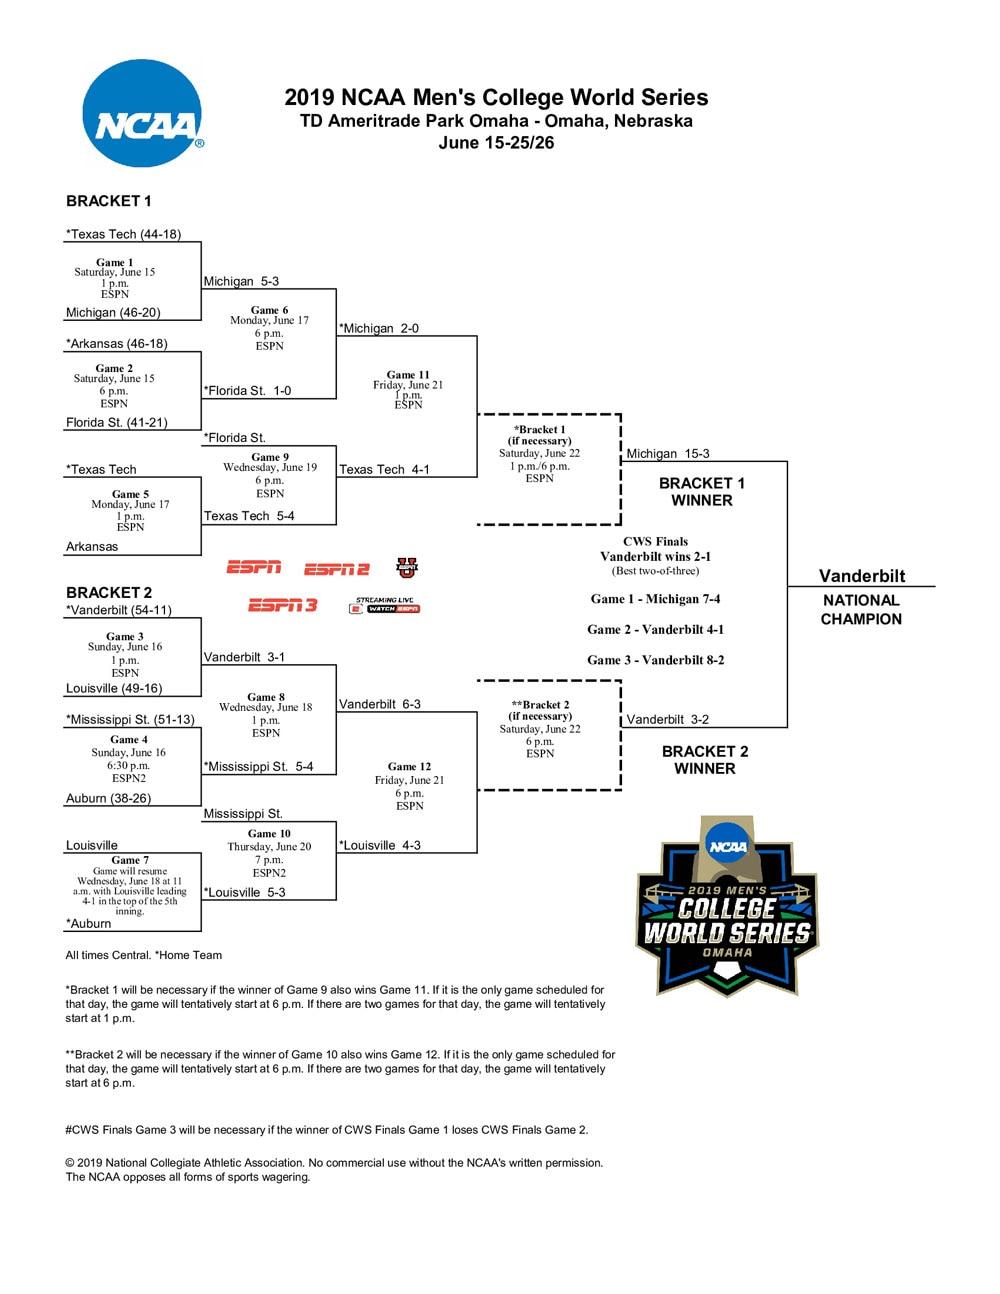 College World Series 2020 schedule | NCAA com